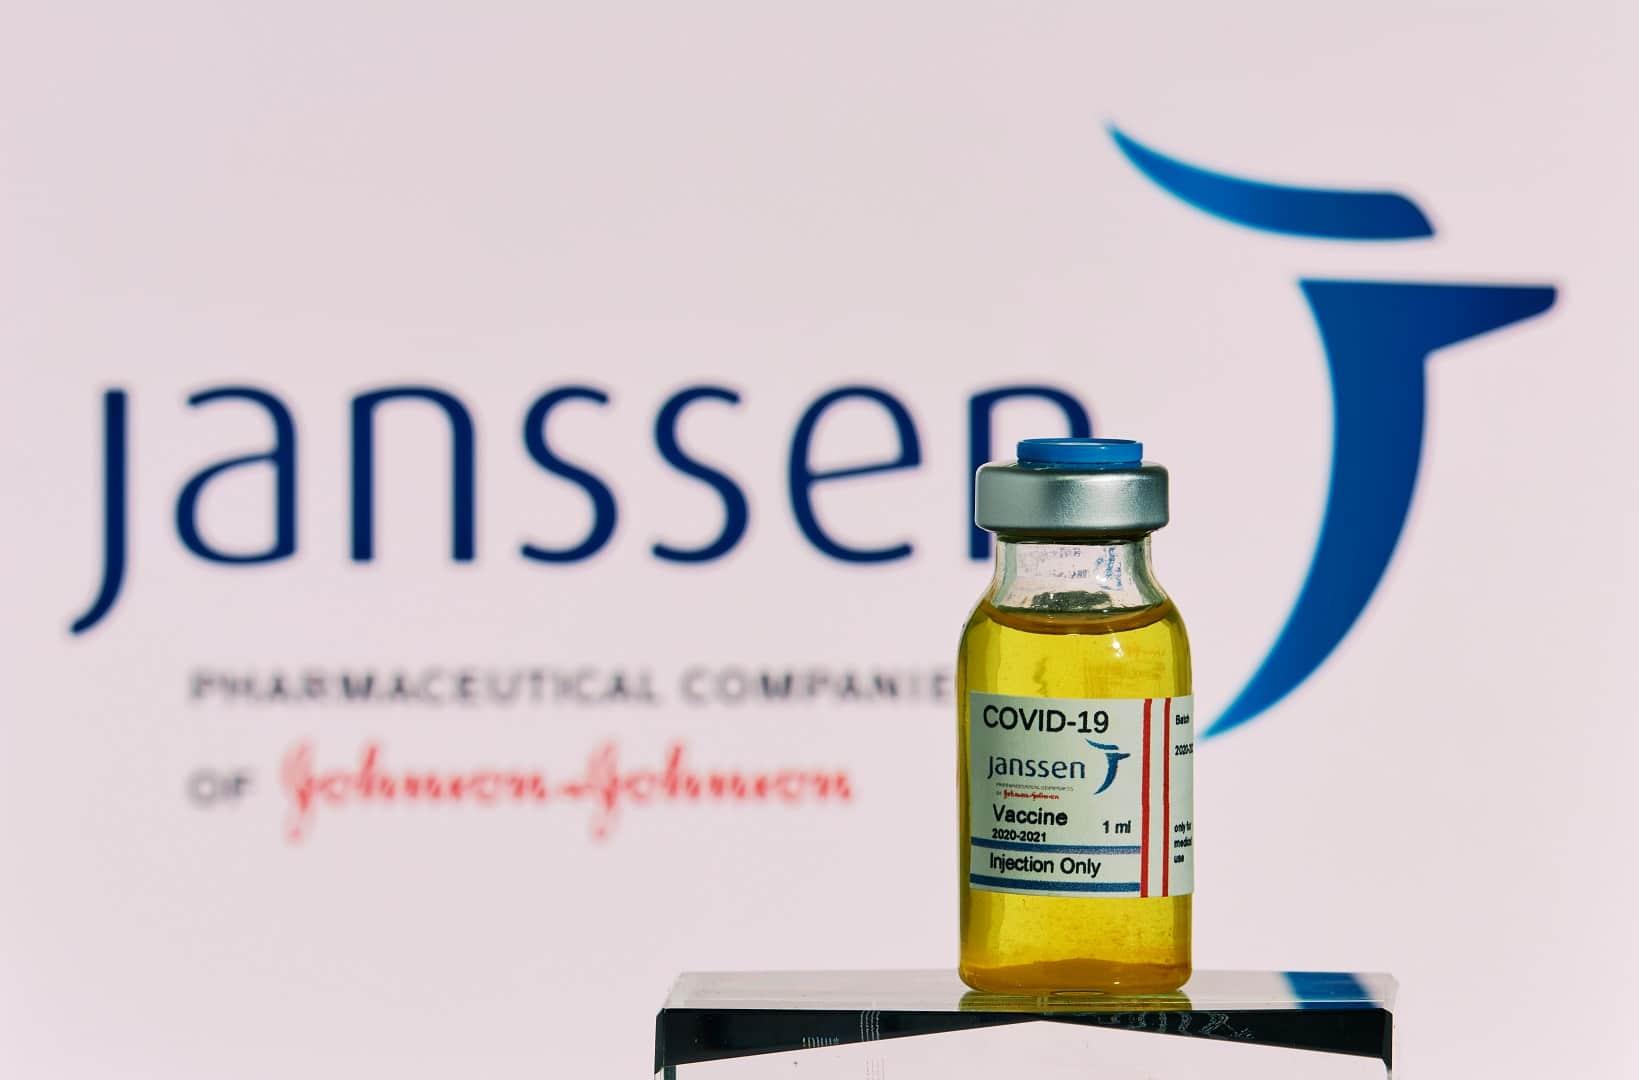 Janssen faz pedido de uso emergencial à vacina contra Covid-19